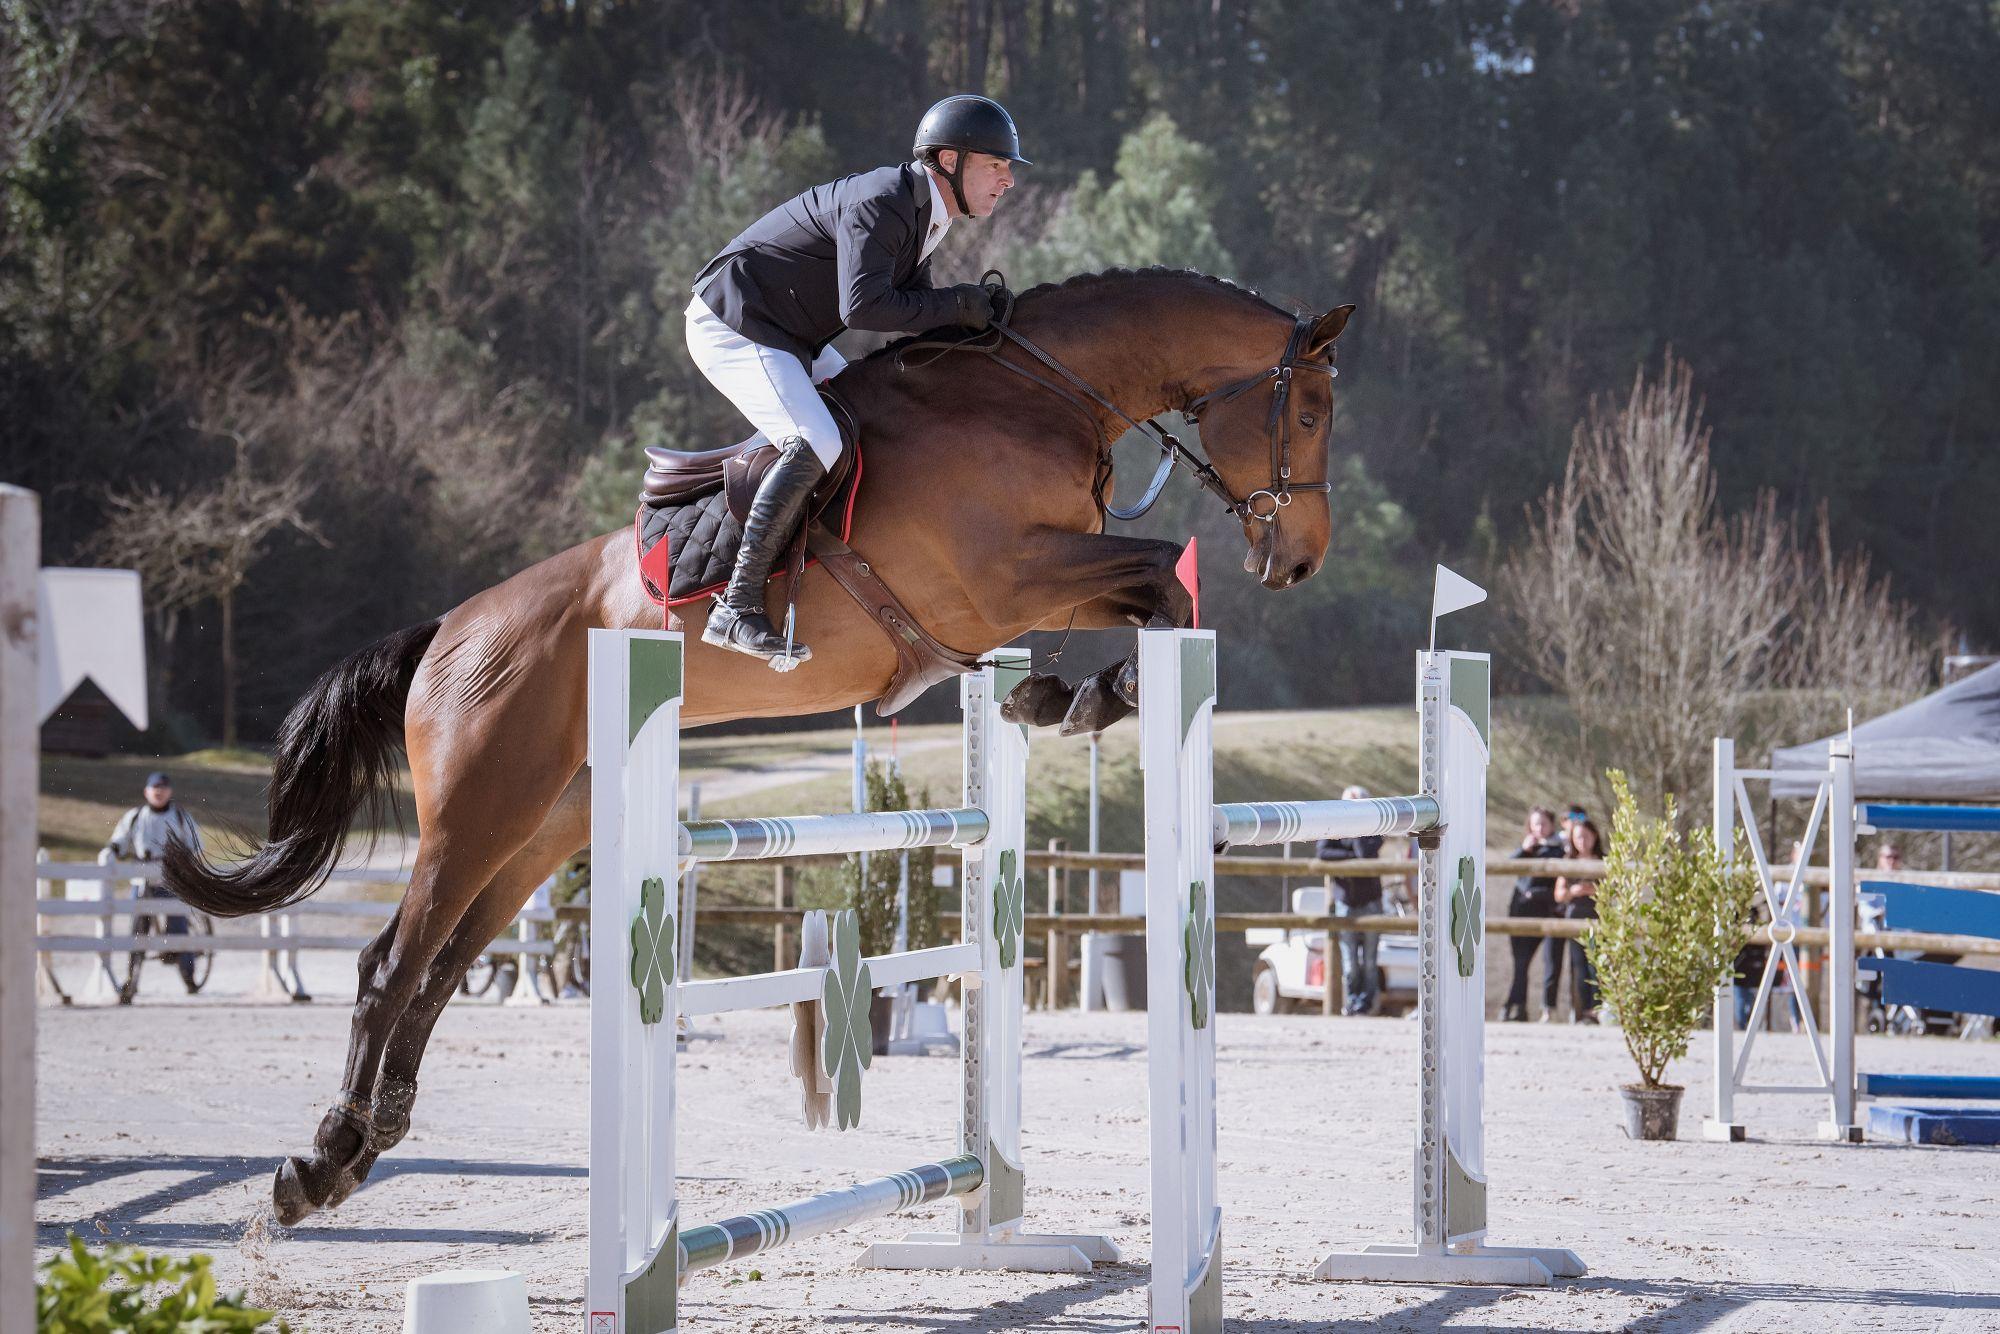 diamanti-van-de-helle-z-las-jump-biarritz-show-jumping-horses-feb-23-rd-2019-3